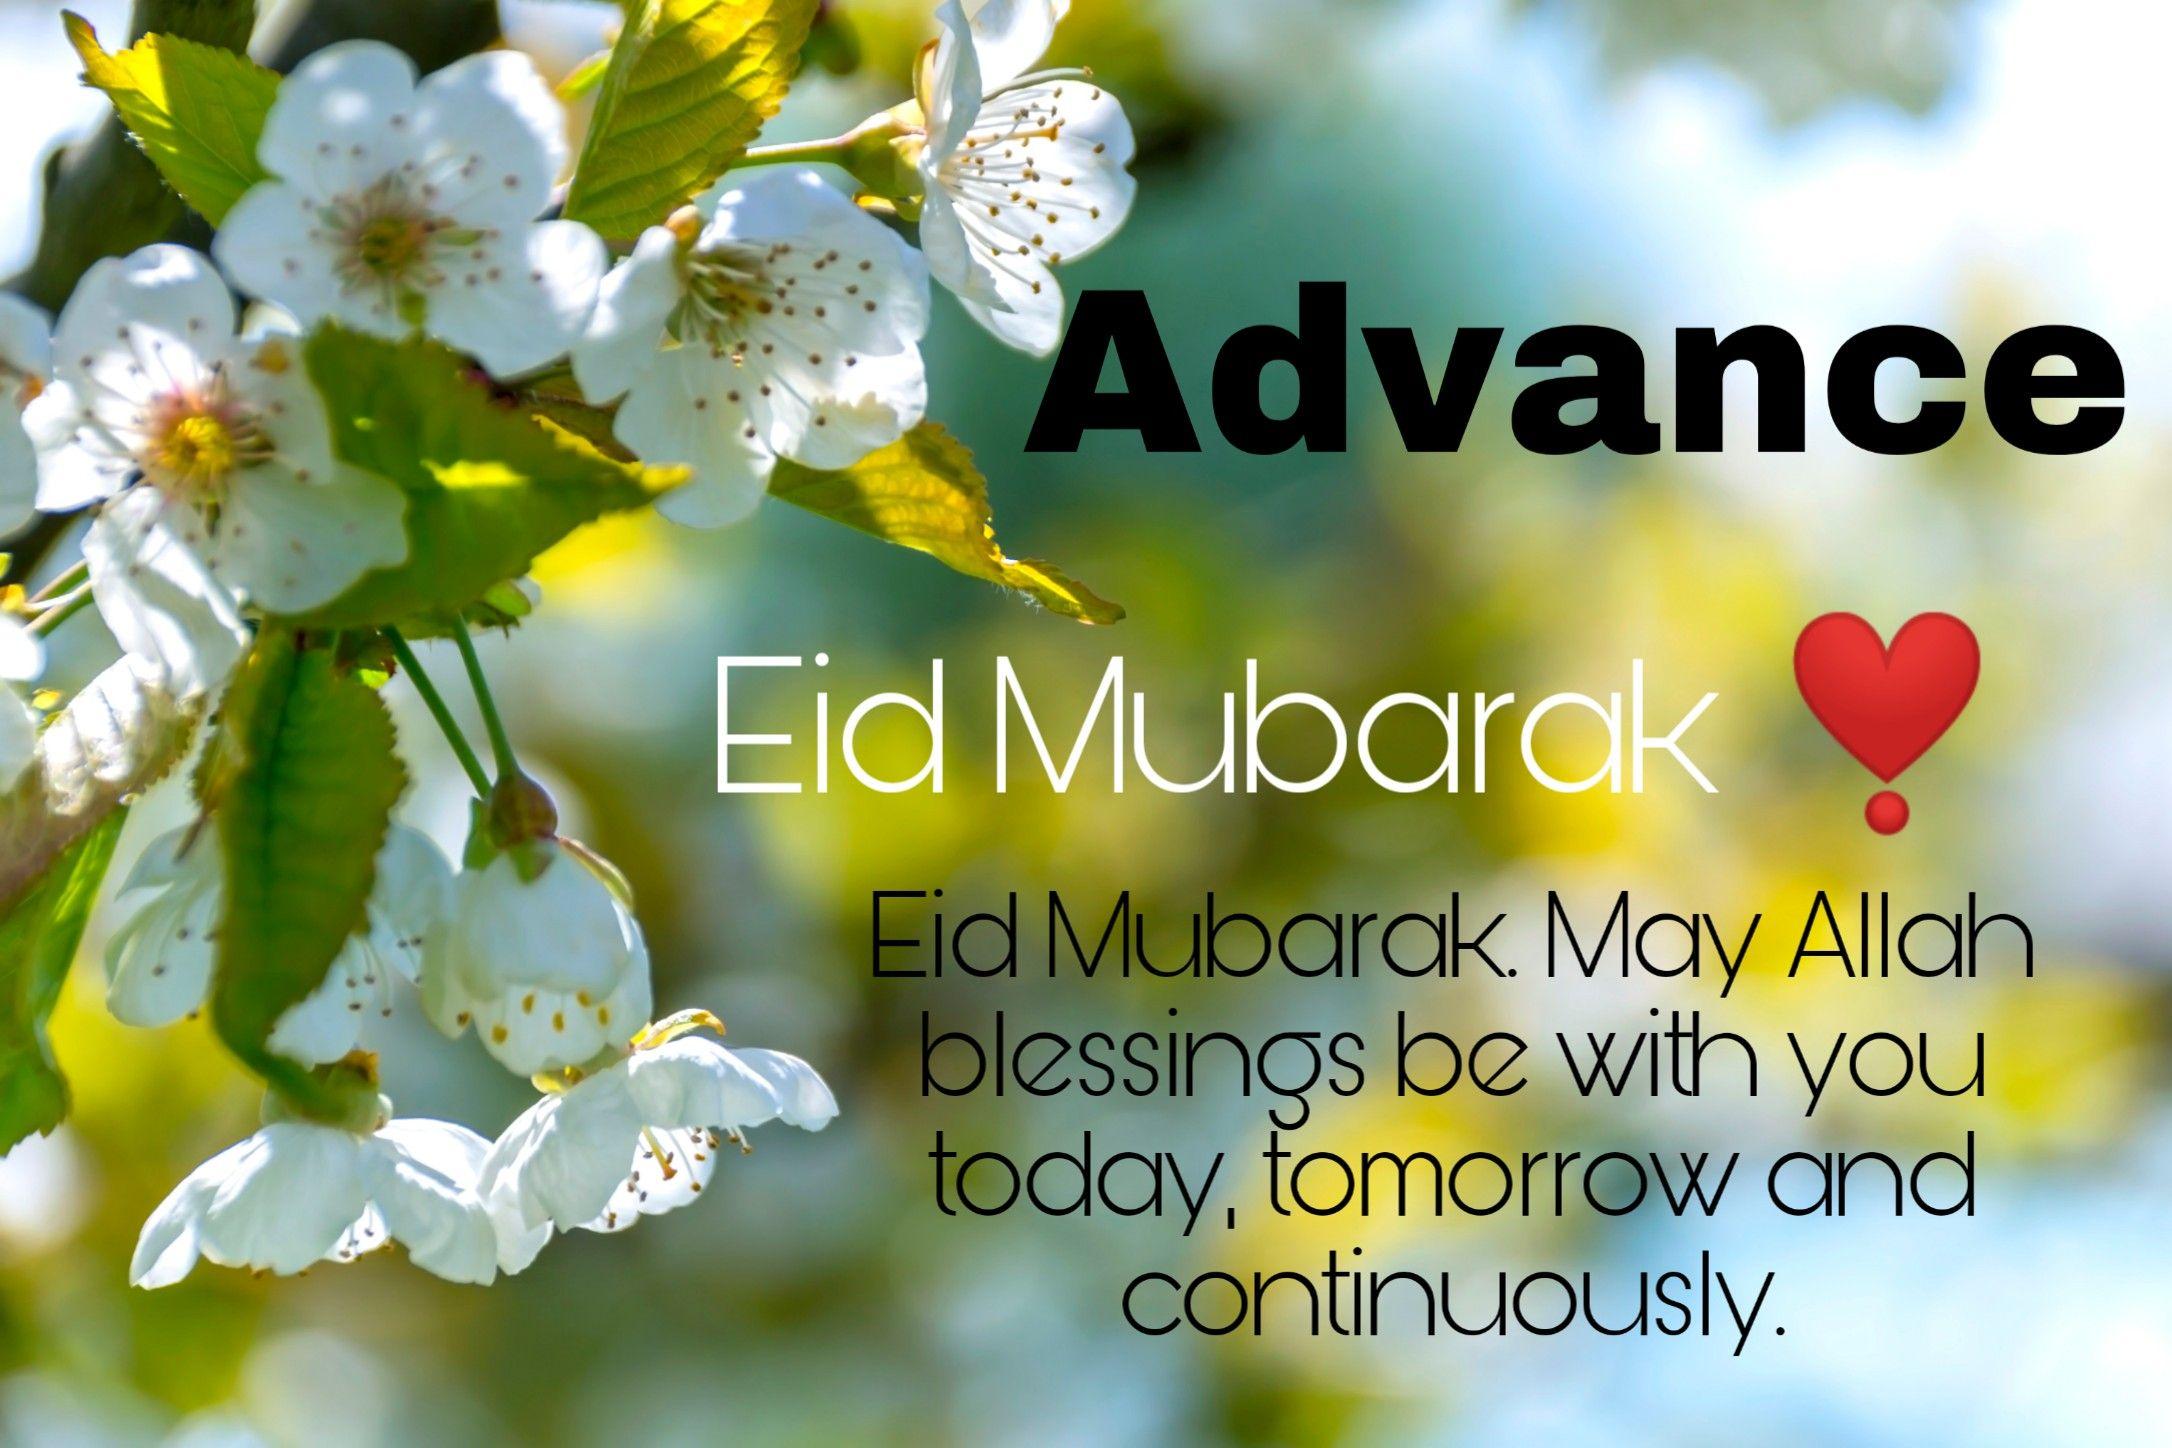 ADVANCE) Eid Mubarak Wishes in urdu/english/Hindi 2020 New Collection | Eid mubarak wishes, Happy eid mubarak wishes, Eid mubarak